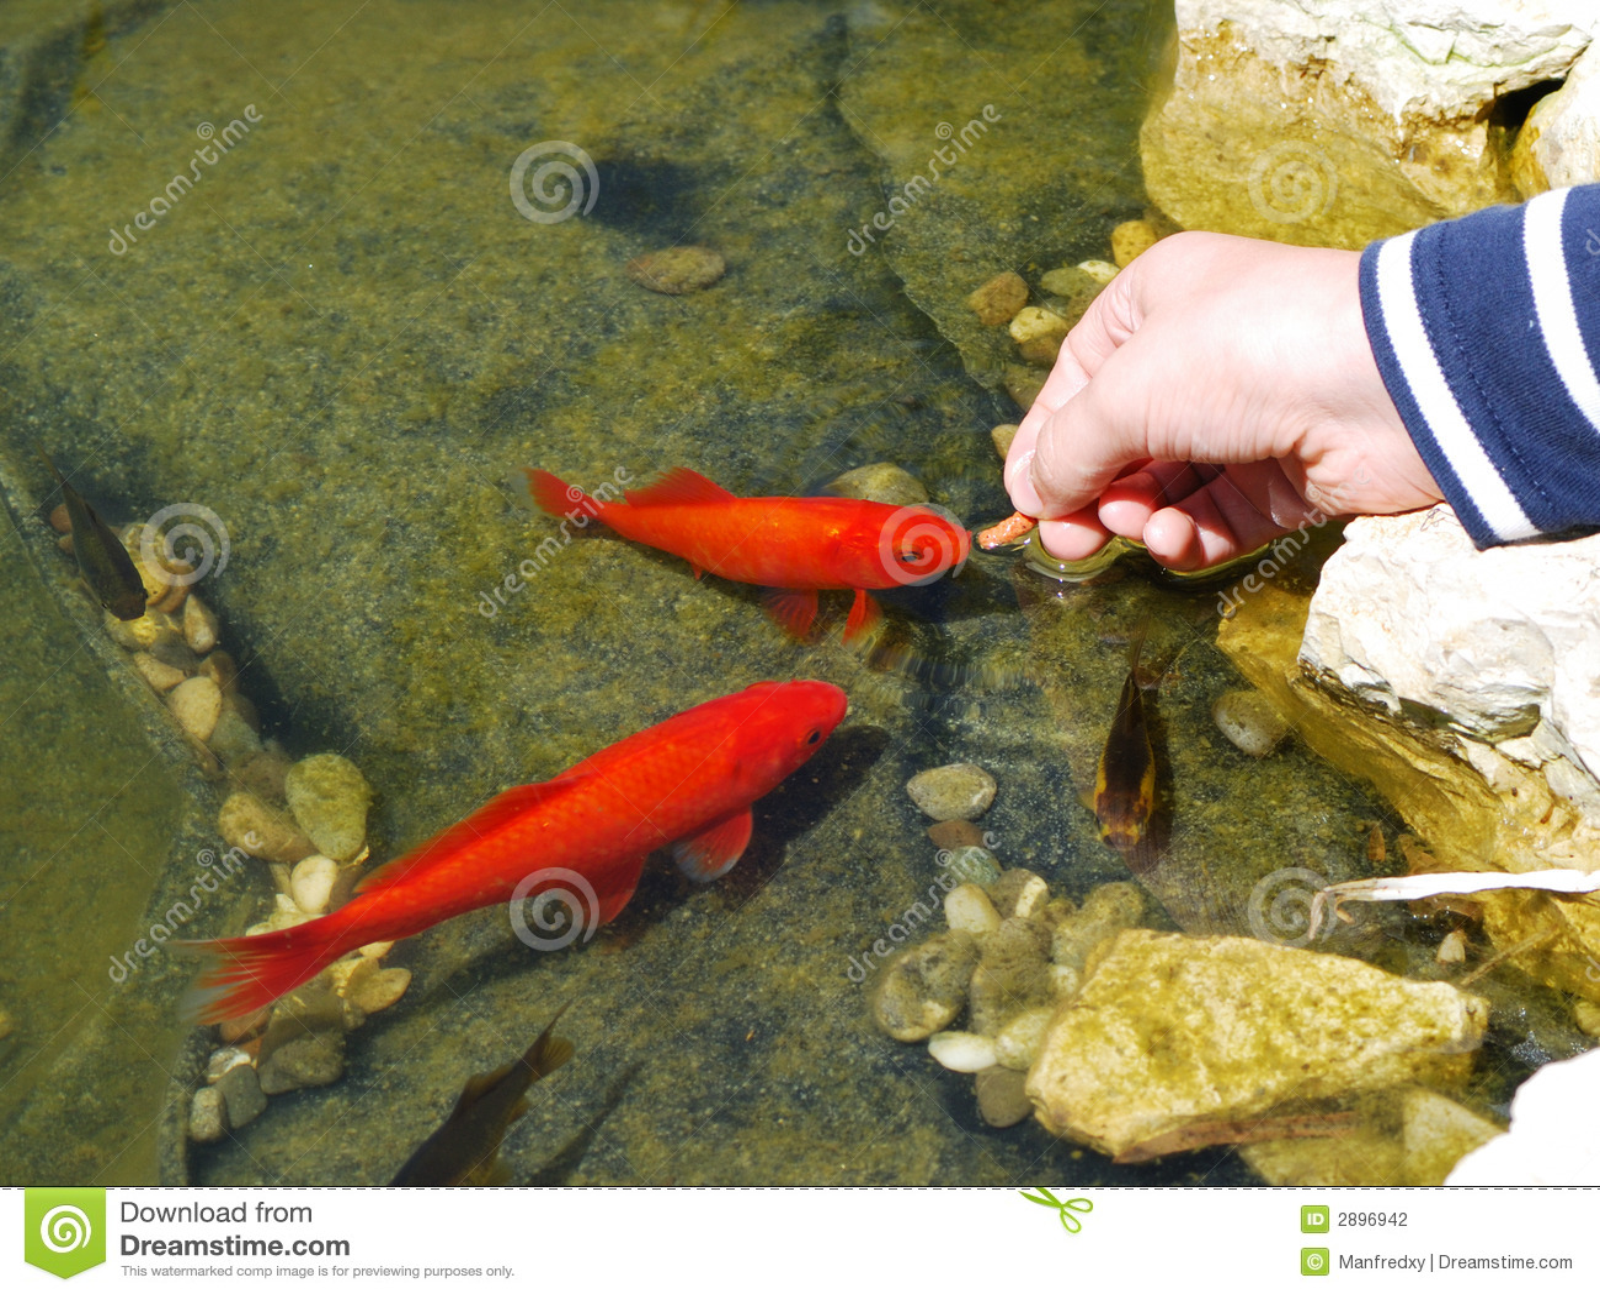 Feeding fish stock photo image of orange fishes fish for How often to feed fish